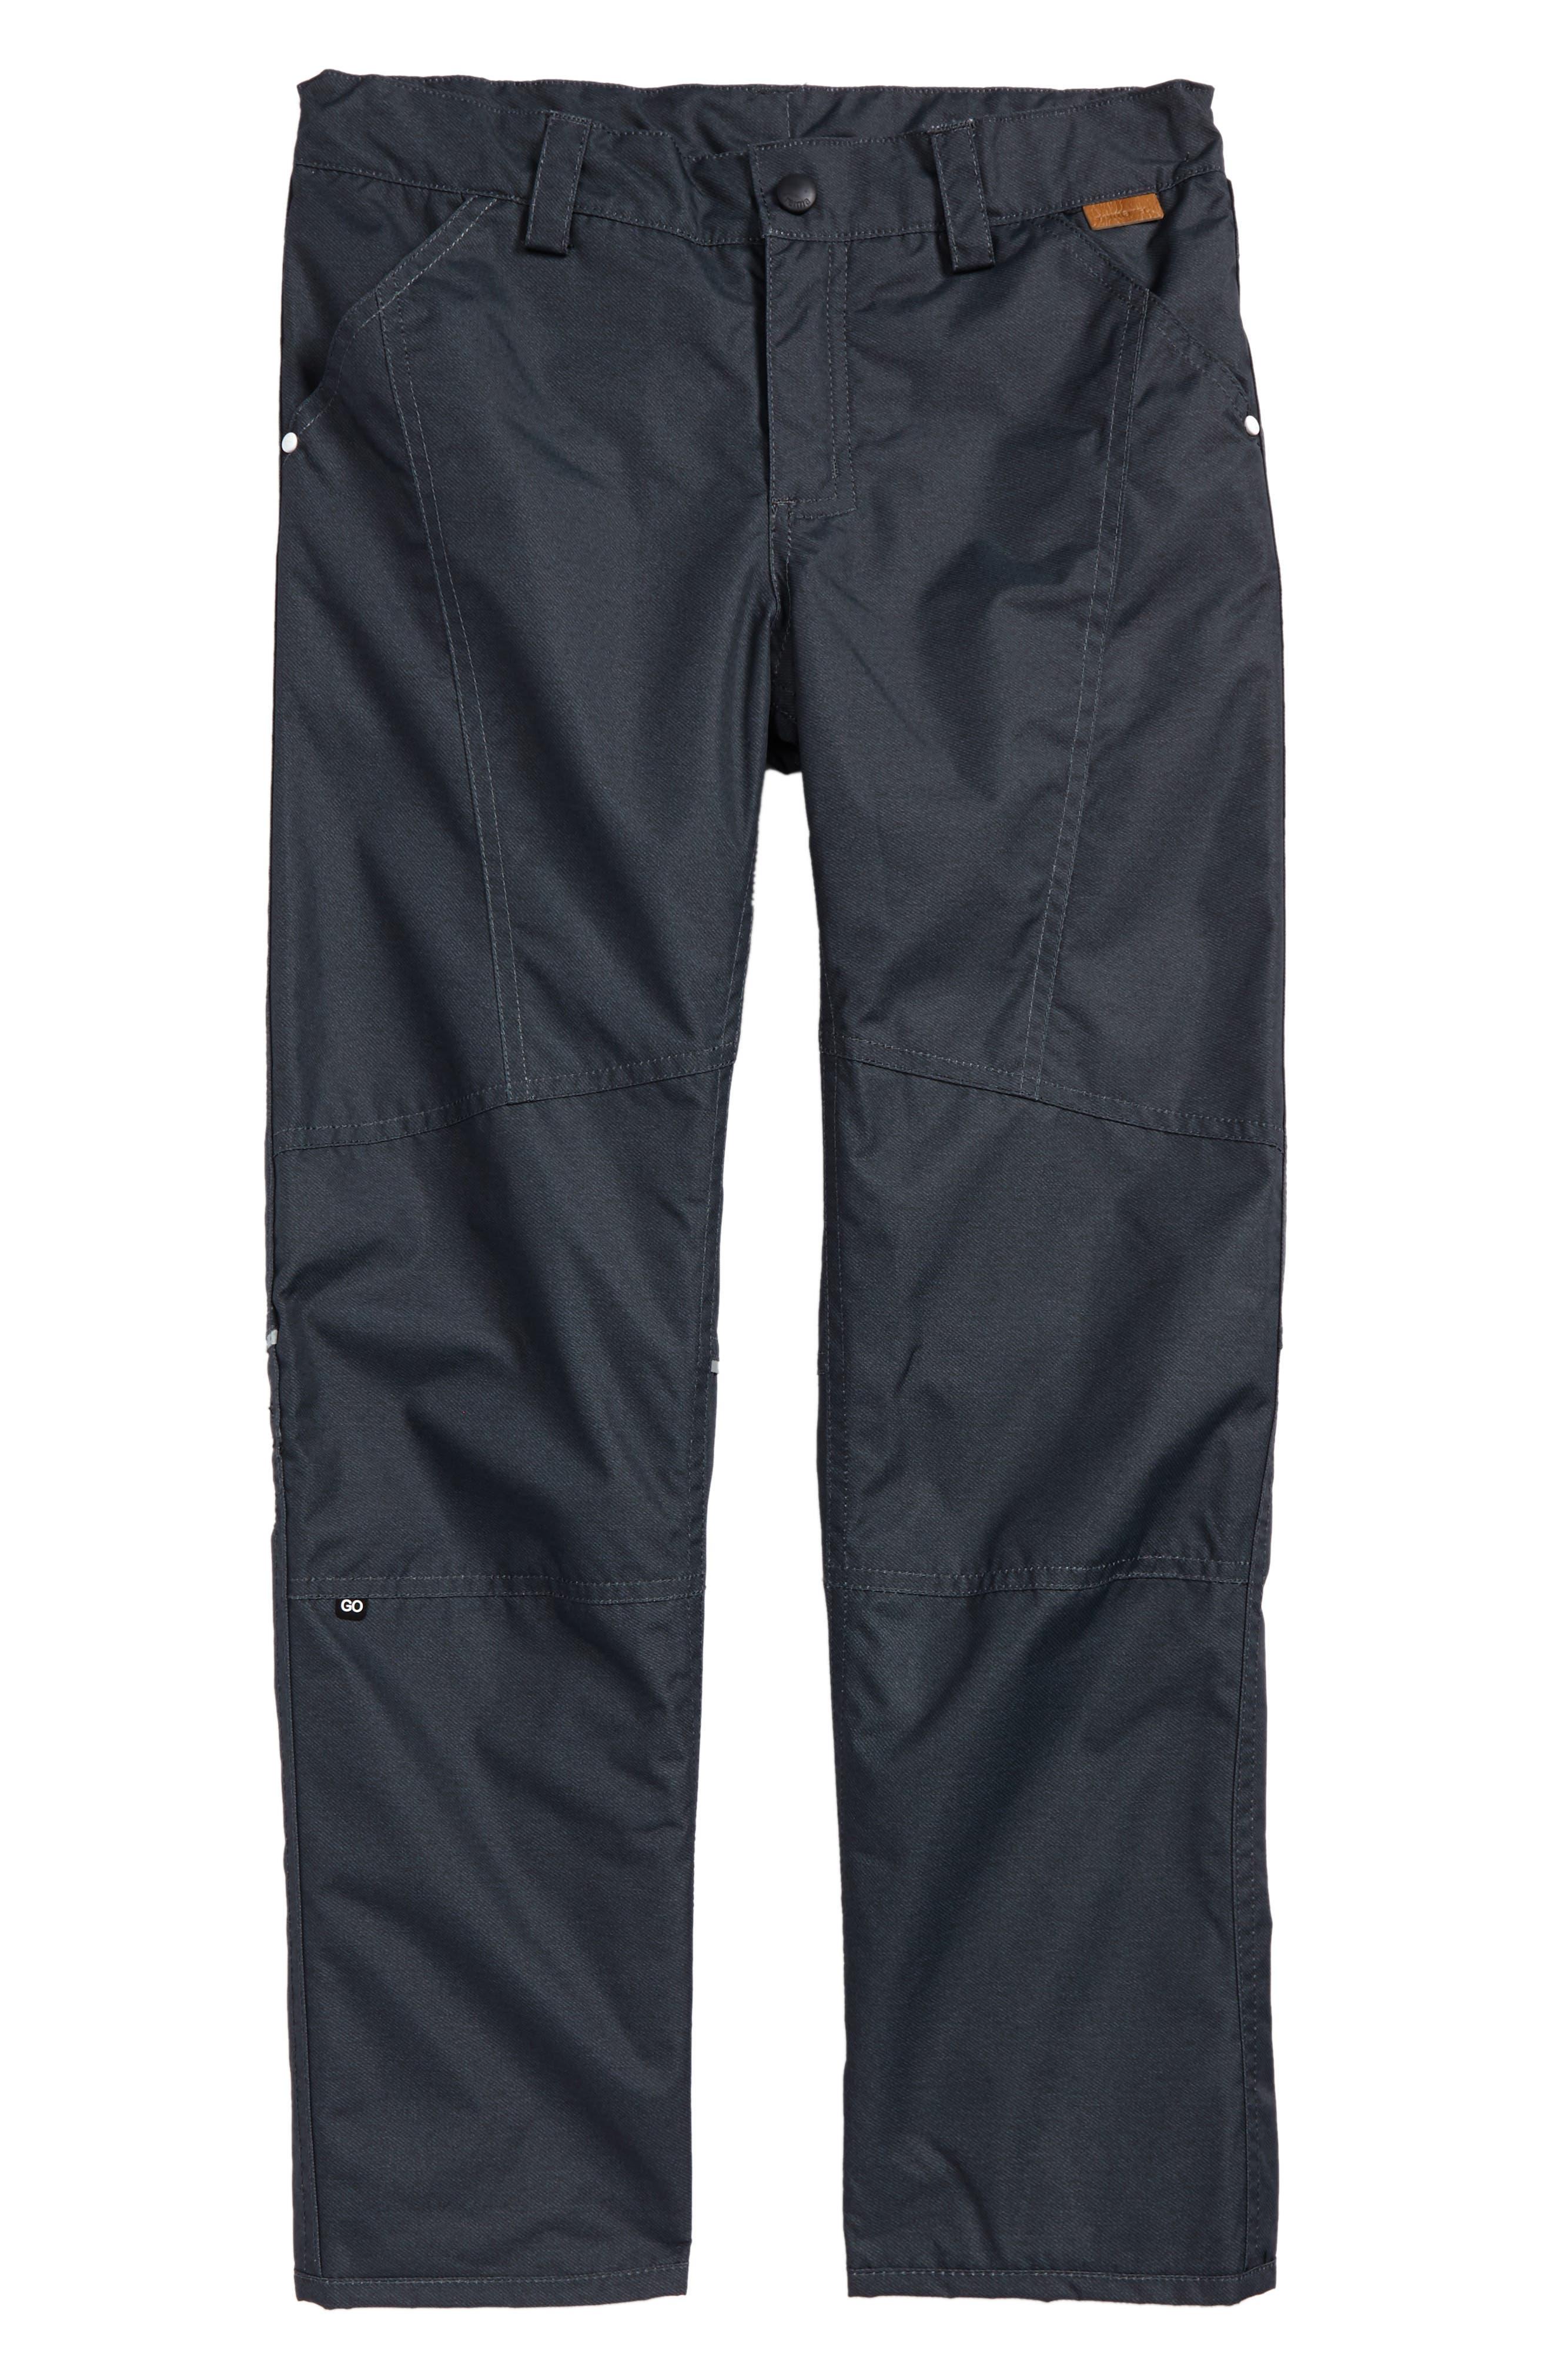 Reimatec<sup>®</sup> Waterproof Pants,                         Main,                         color, 021